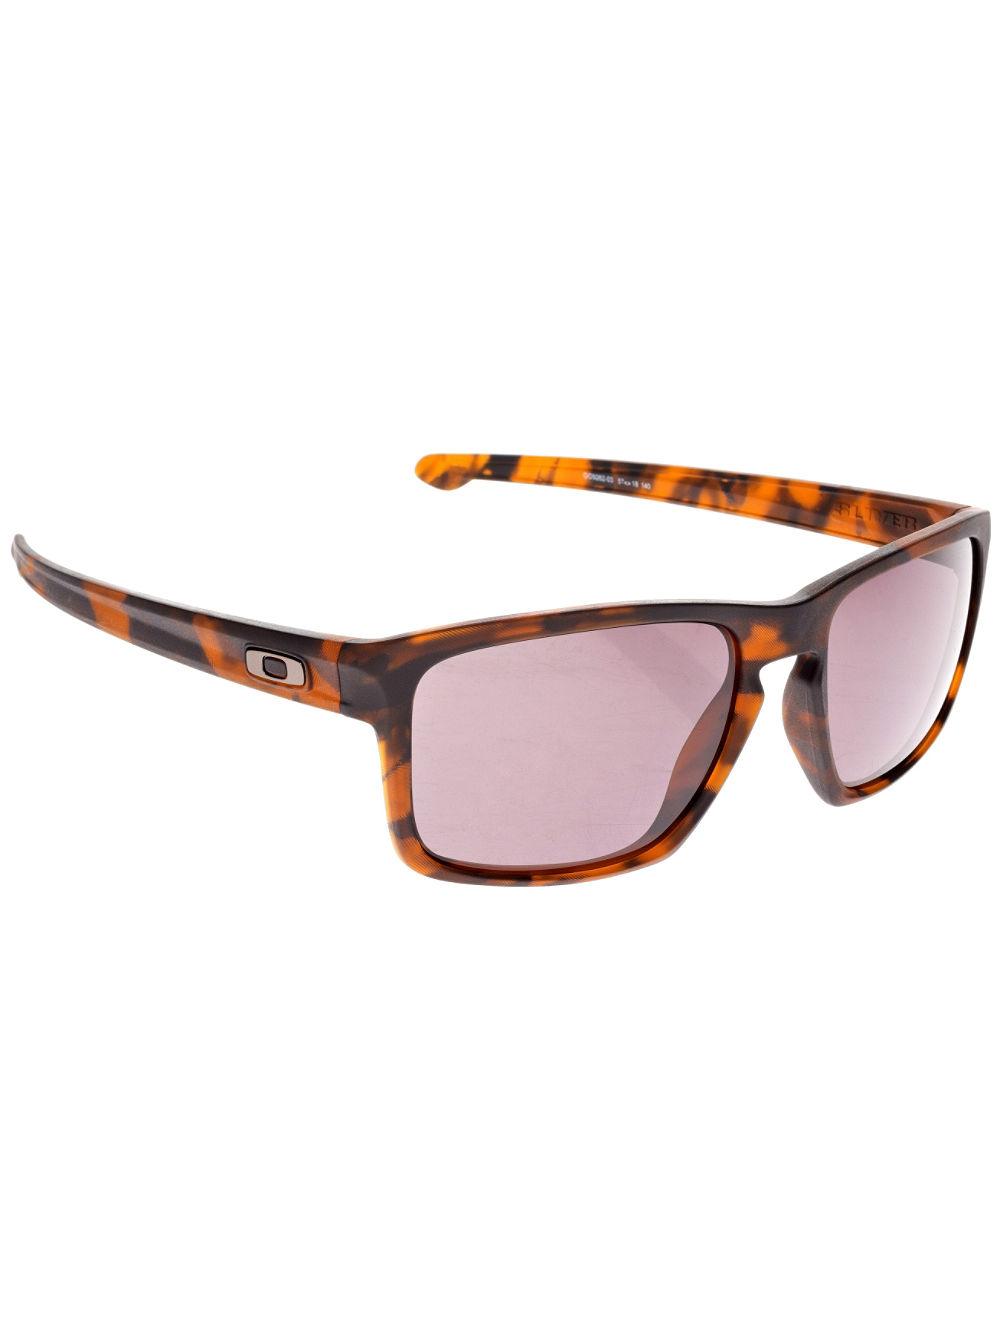 2072679f35e94 Buy Oakley Sliver matte brown tortoise online at Blue Tomato